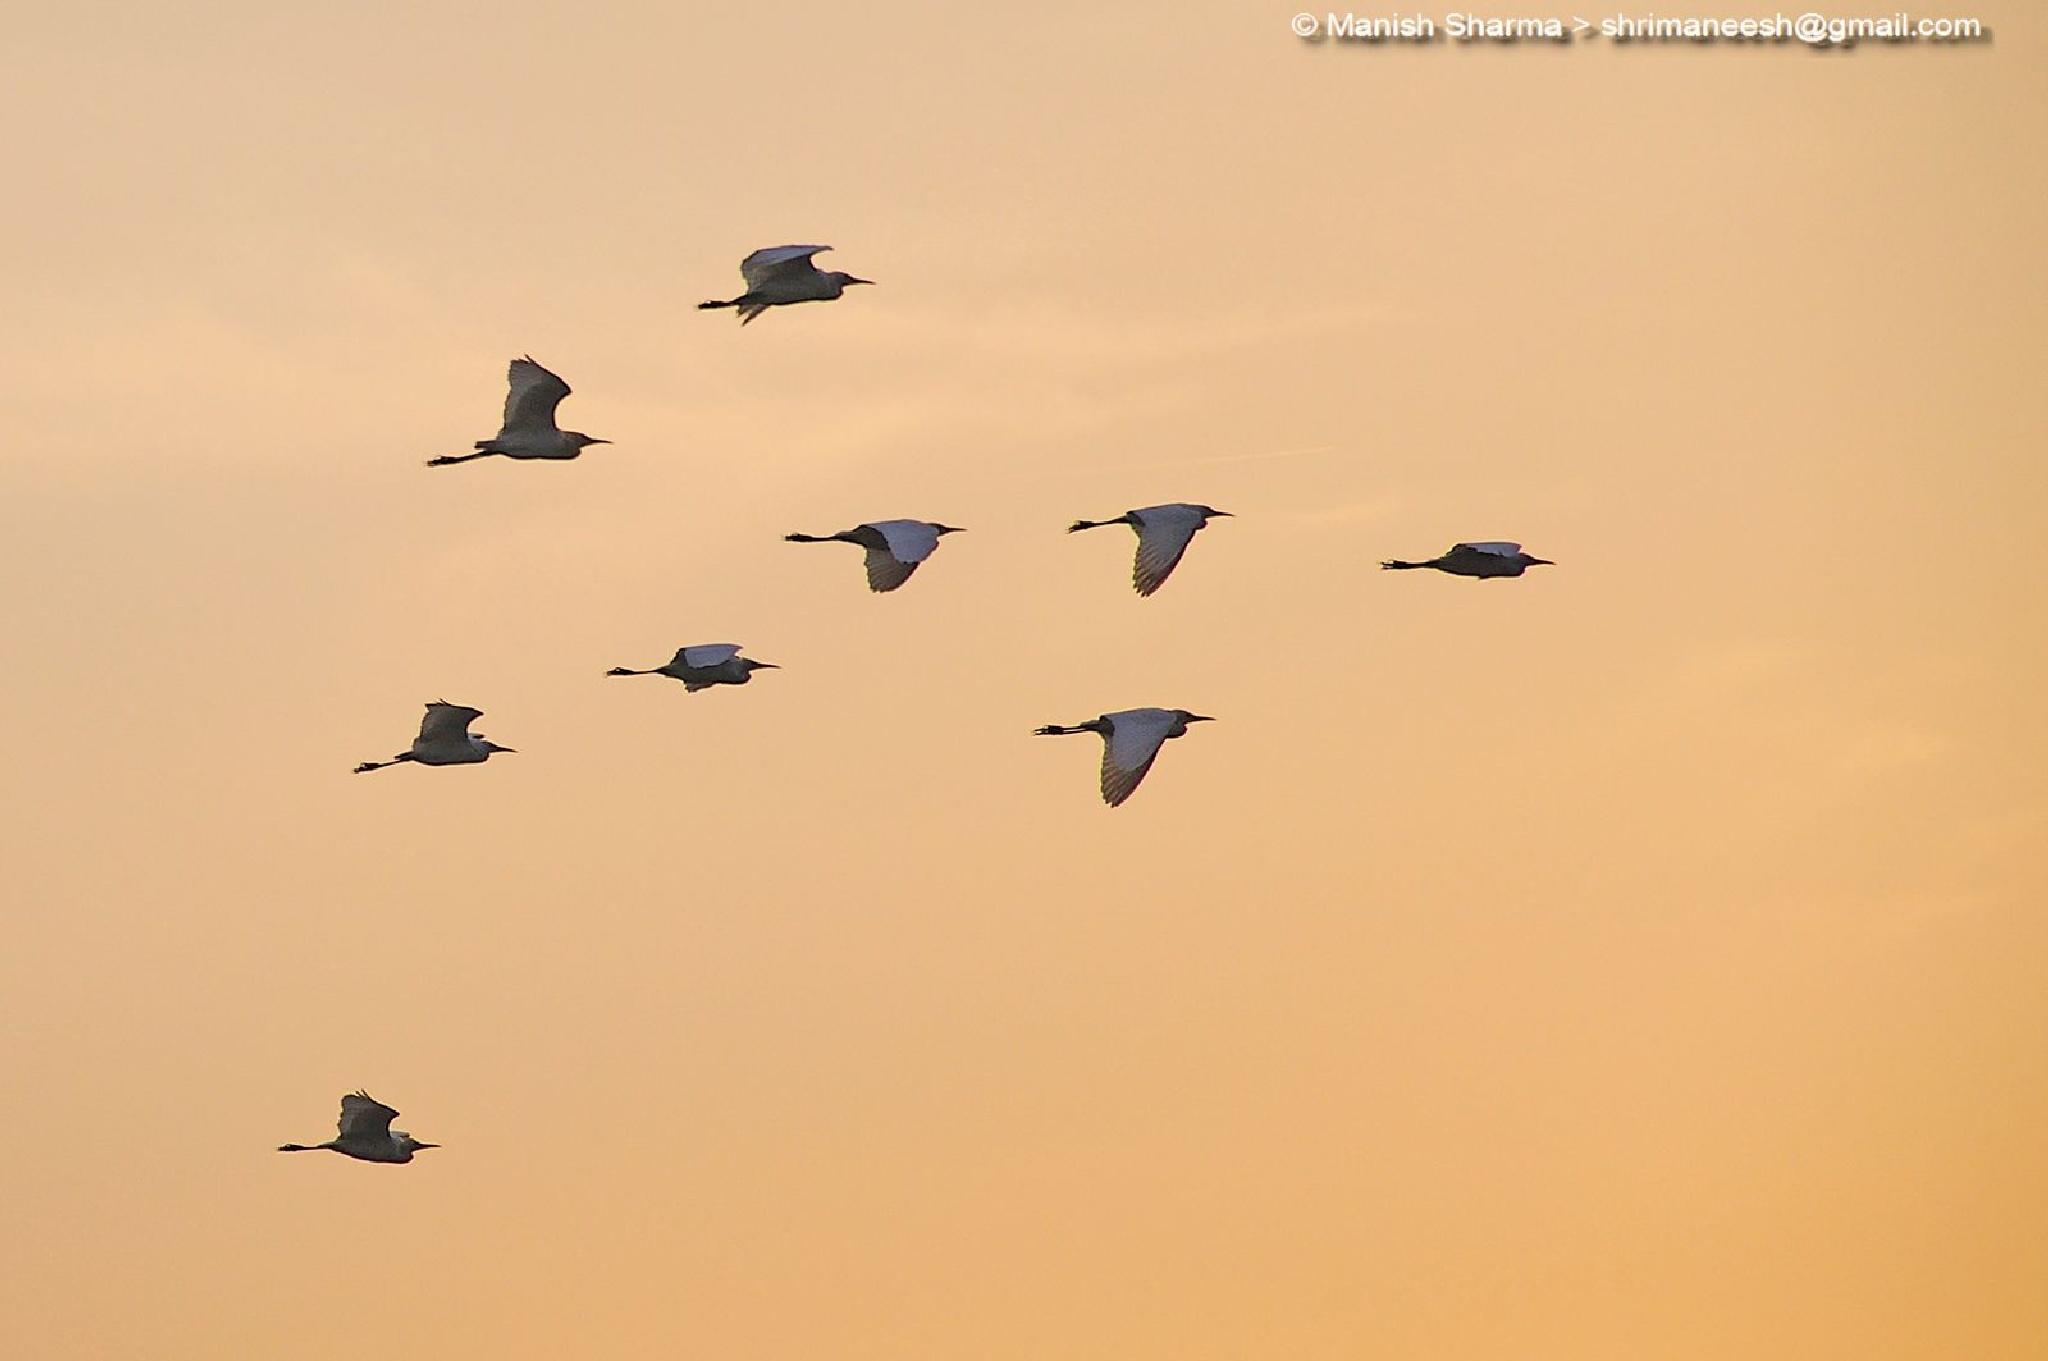 Cattle Egrets by Maneesh Sharma